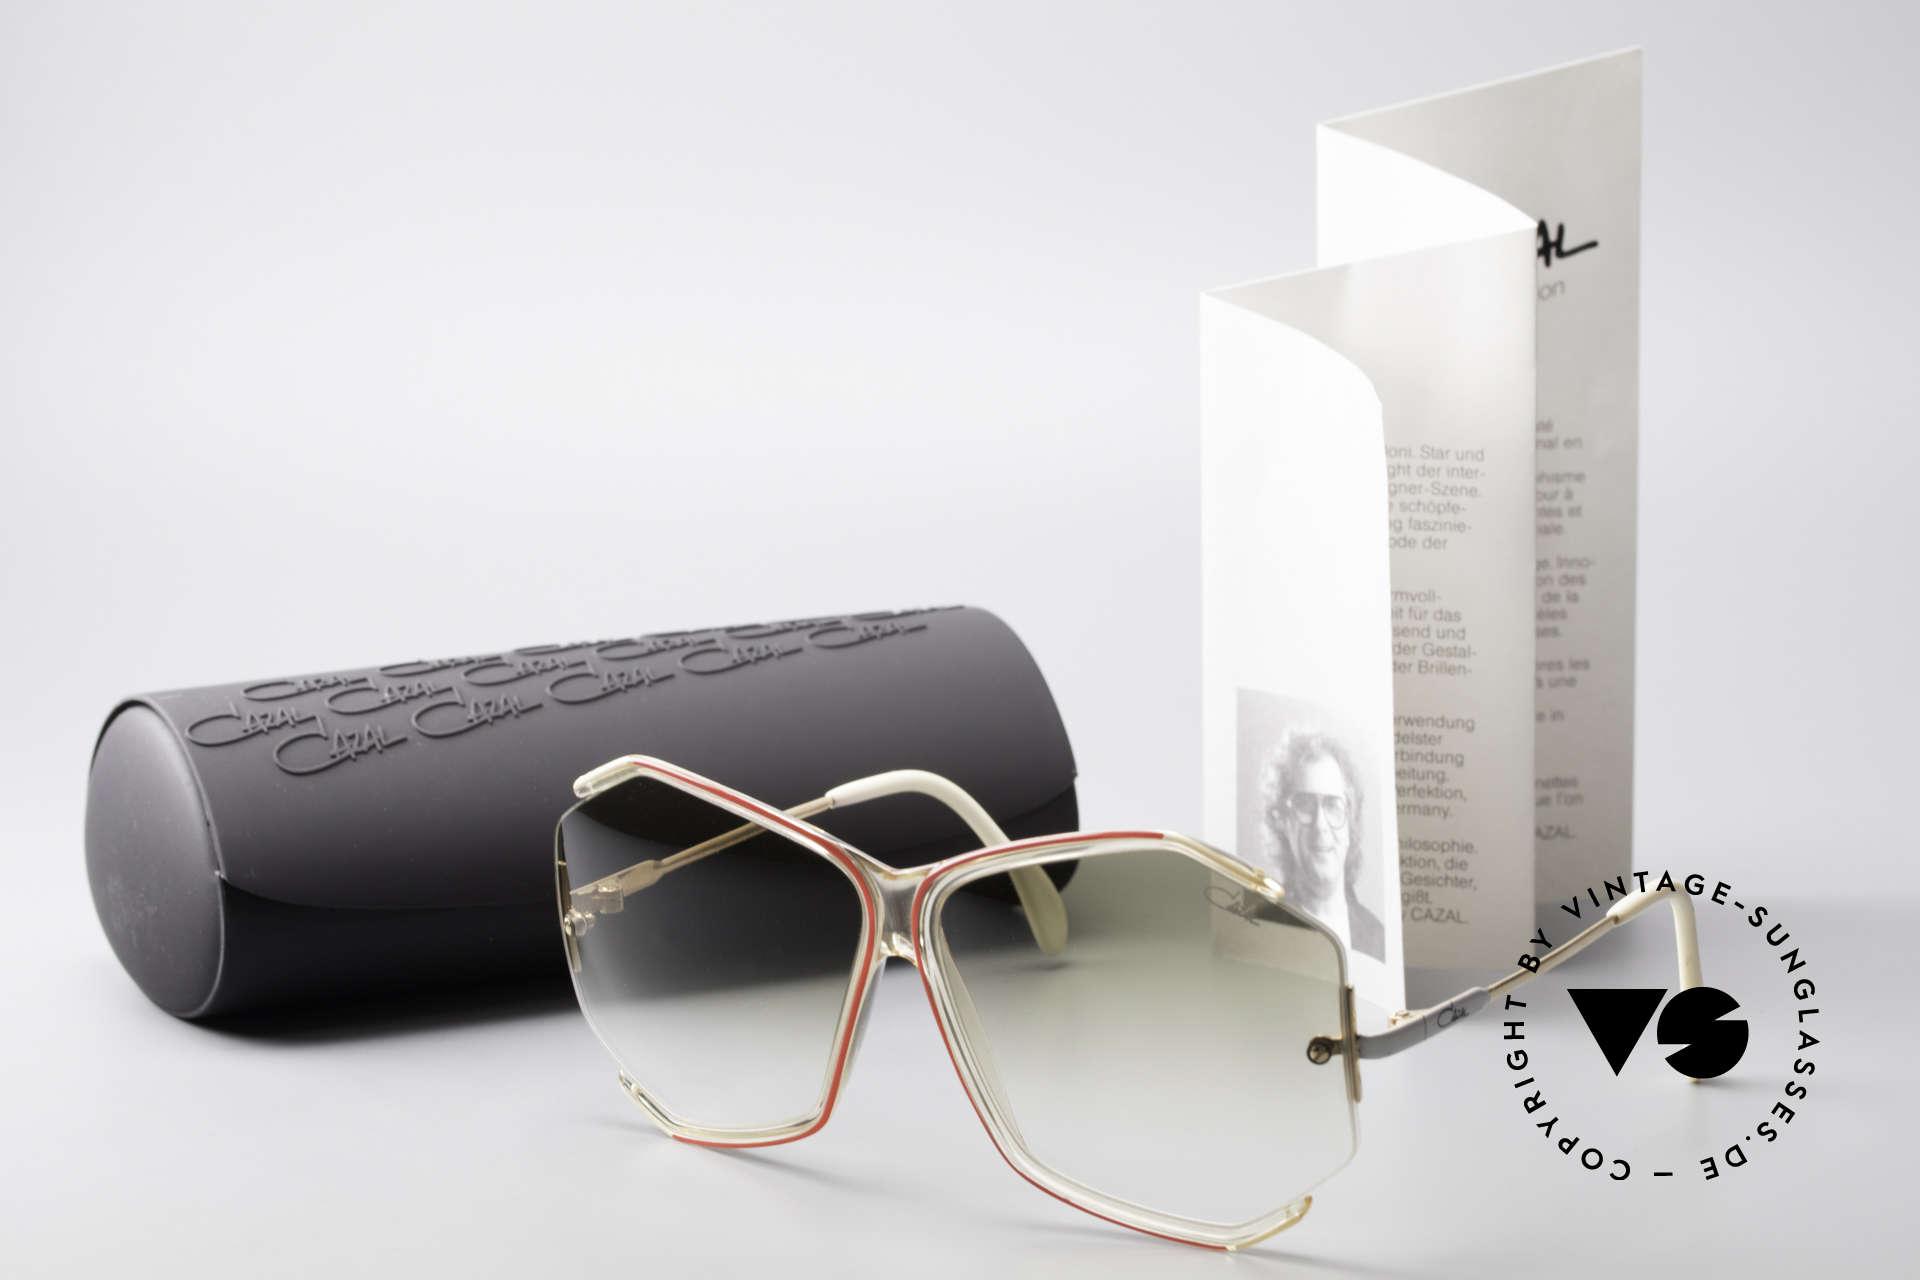 Cazal 852 Vintage 80's Sunglasses XXL, Size: extra large, Made for Women